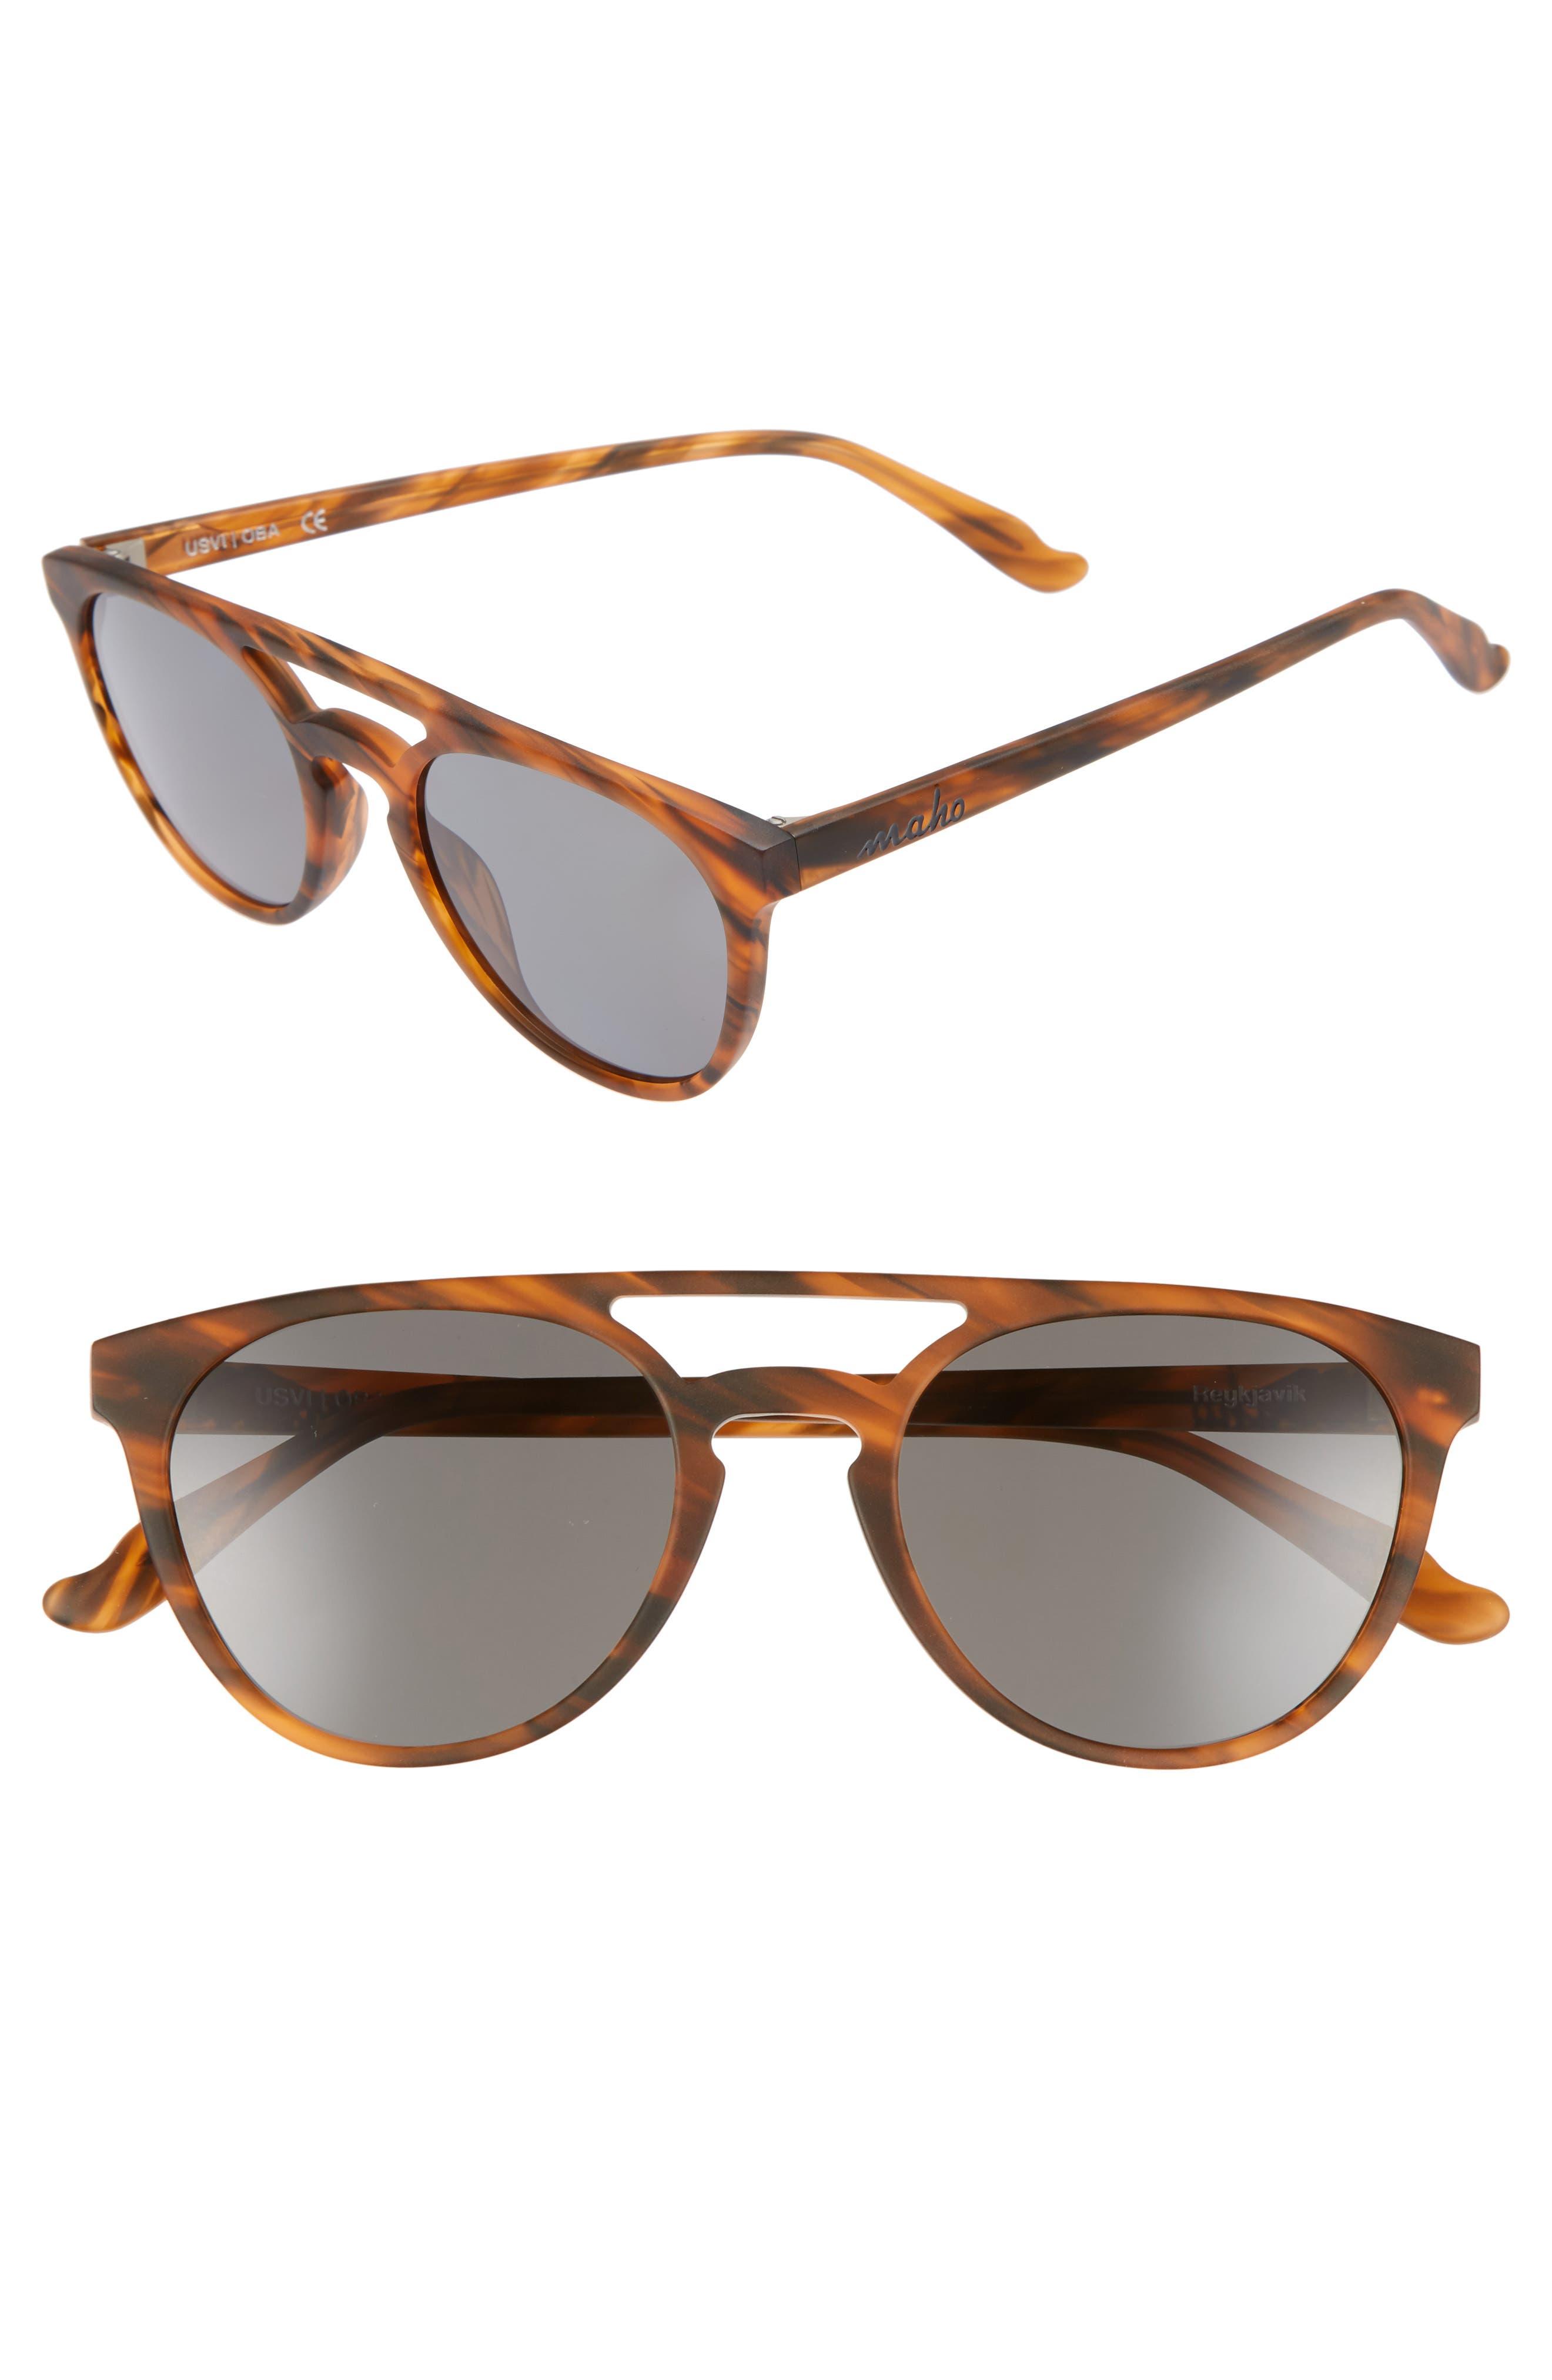 Maho Reykjavík 49mm Polarized Round Sunglasses